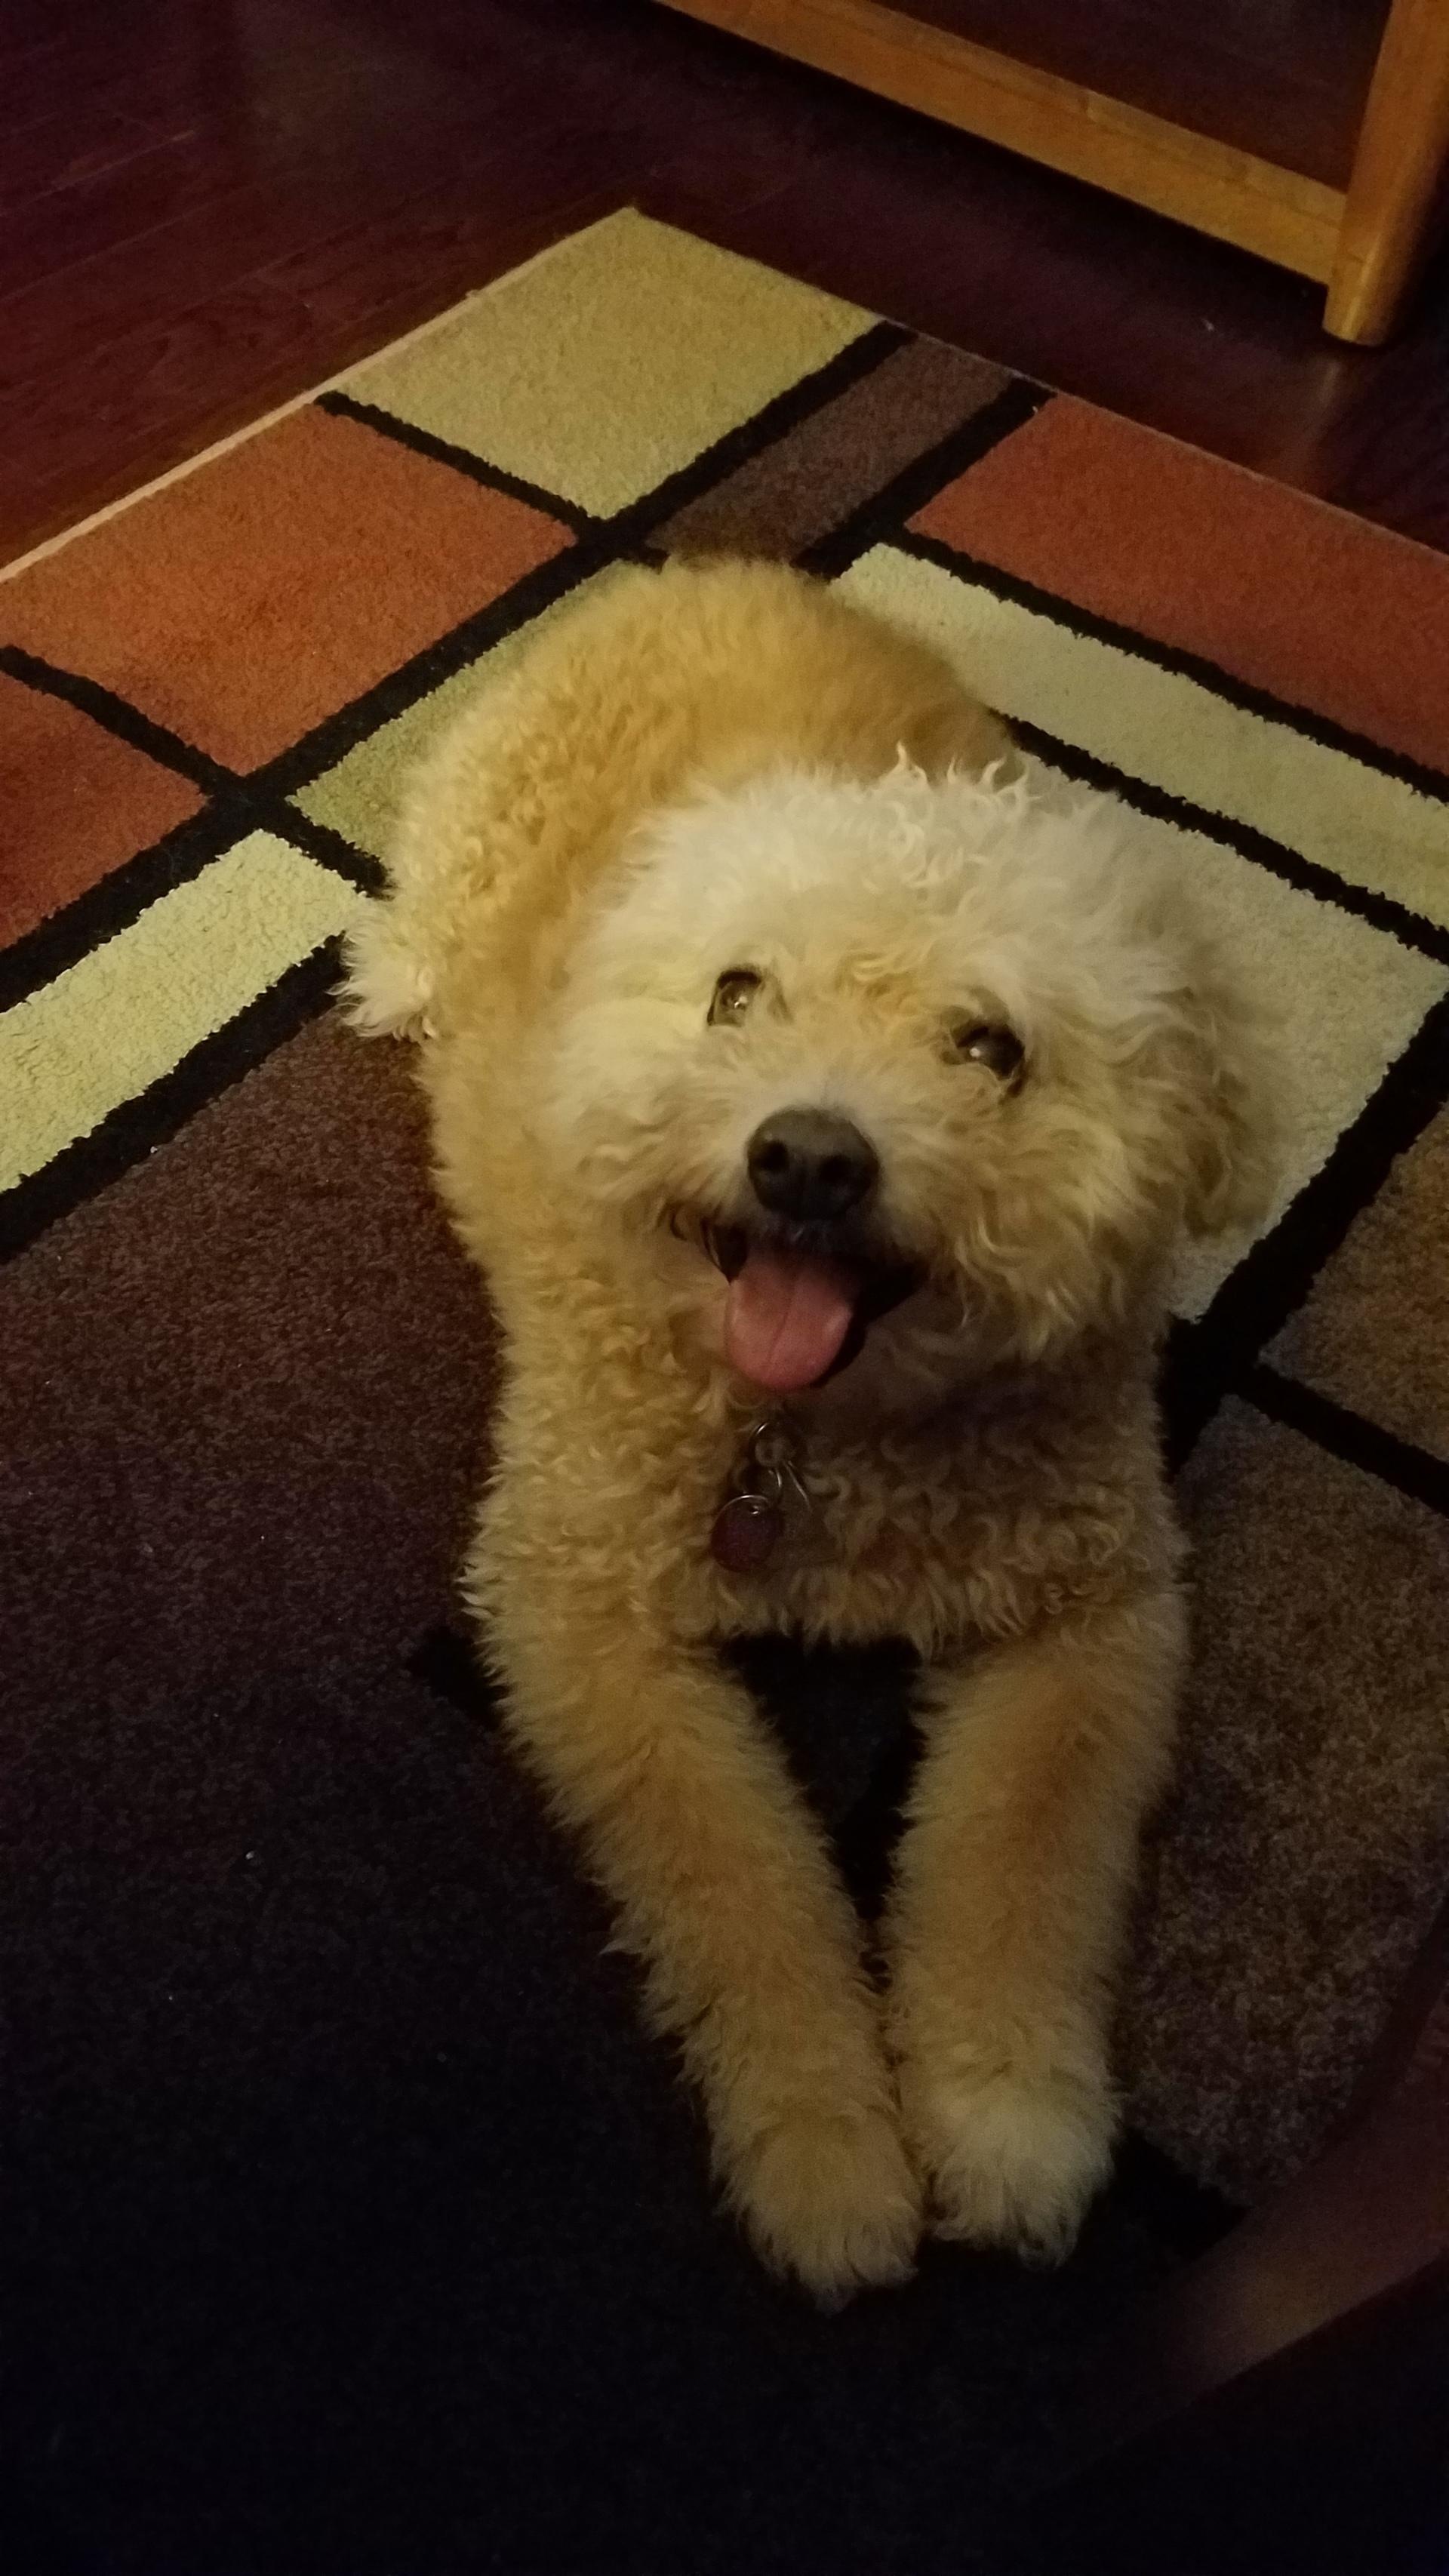 bichon poodle dog | elise81, animal, adorable, no person